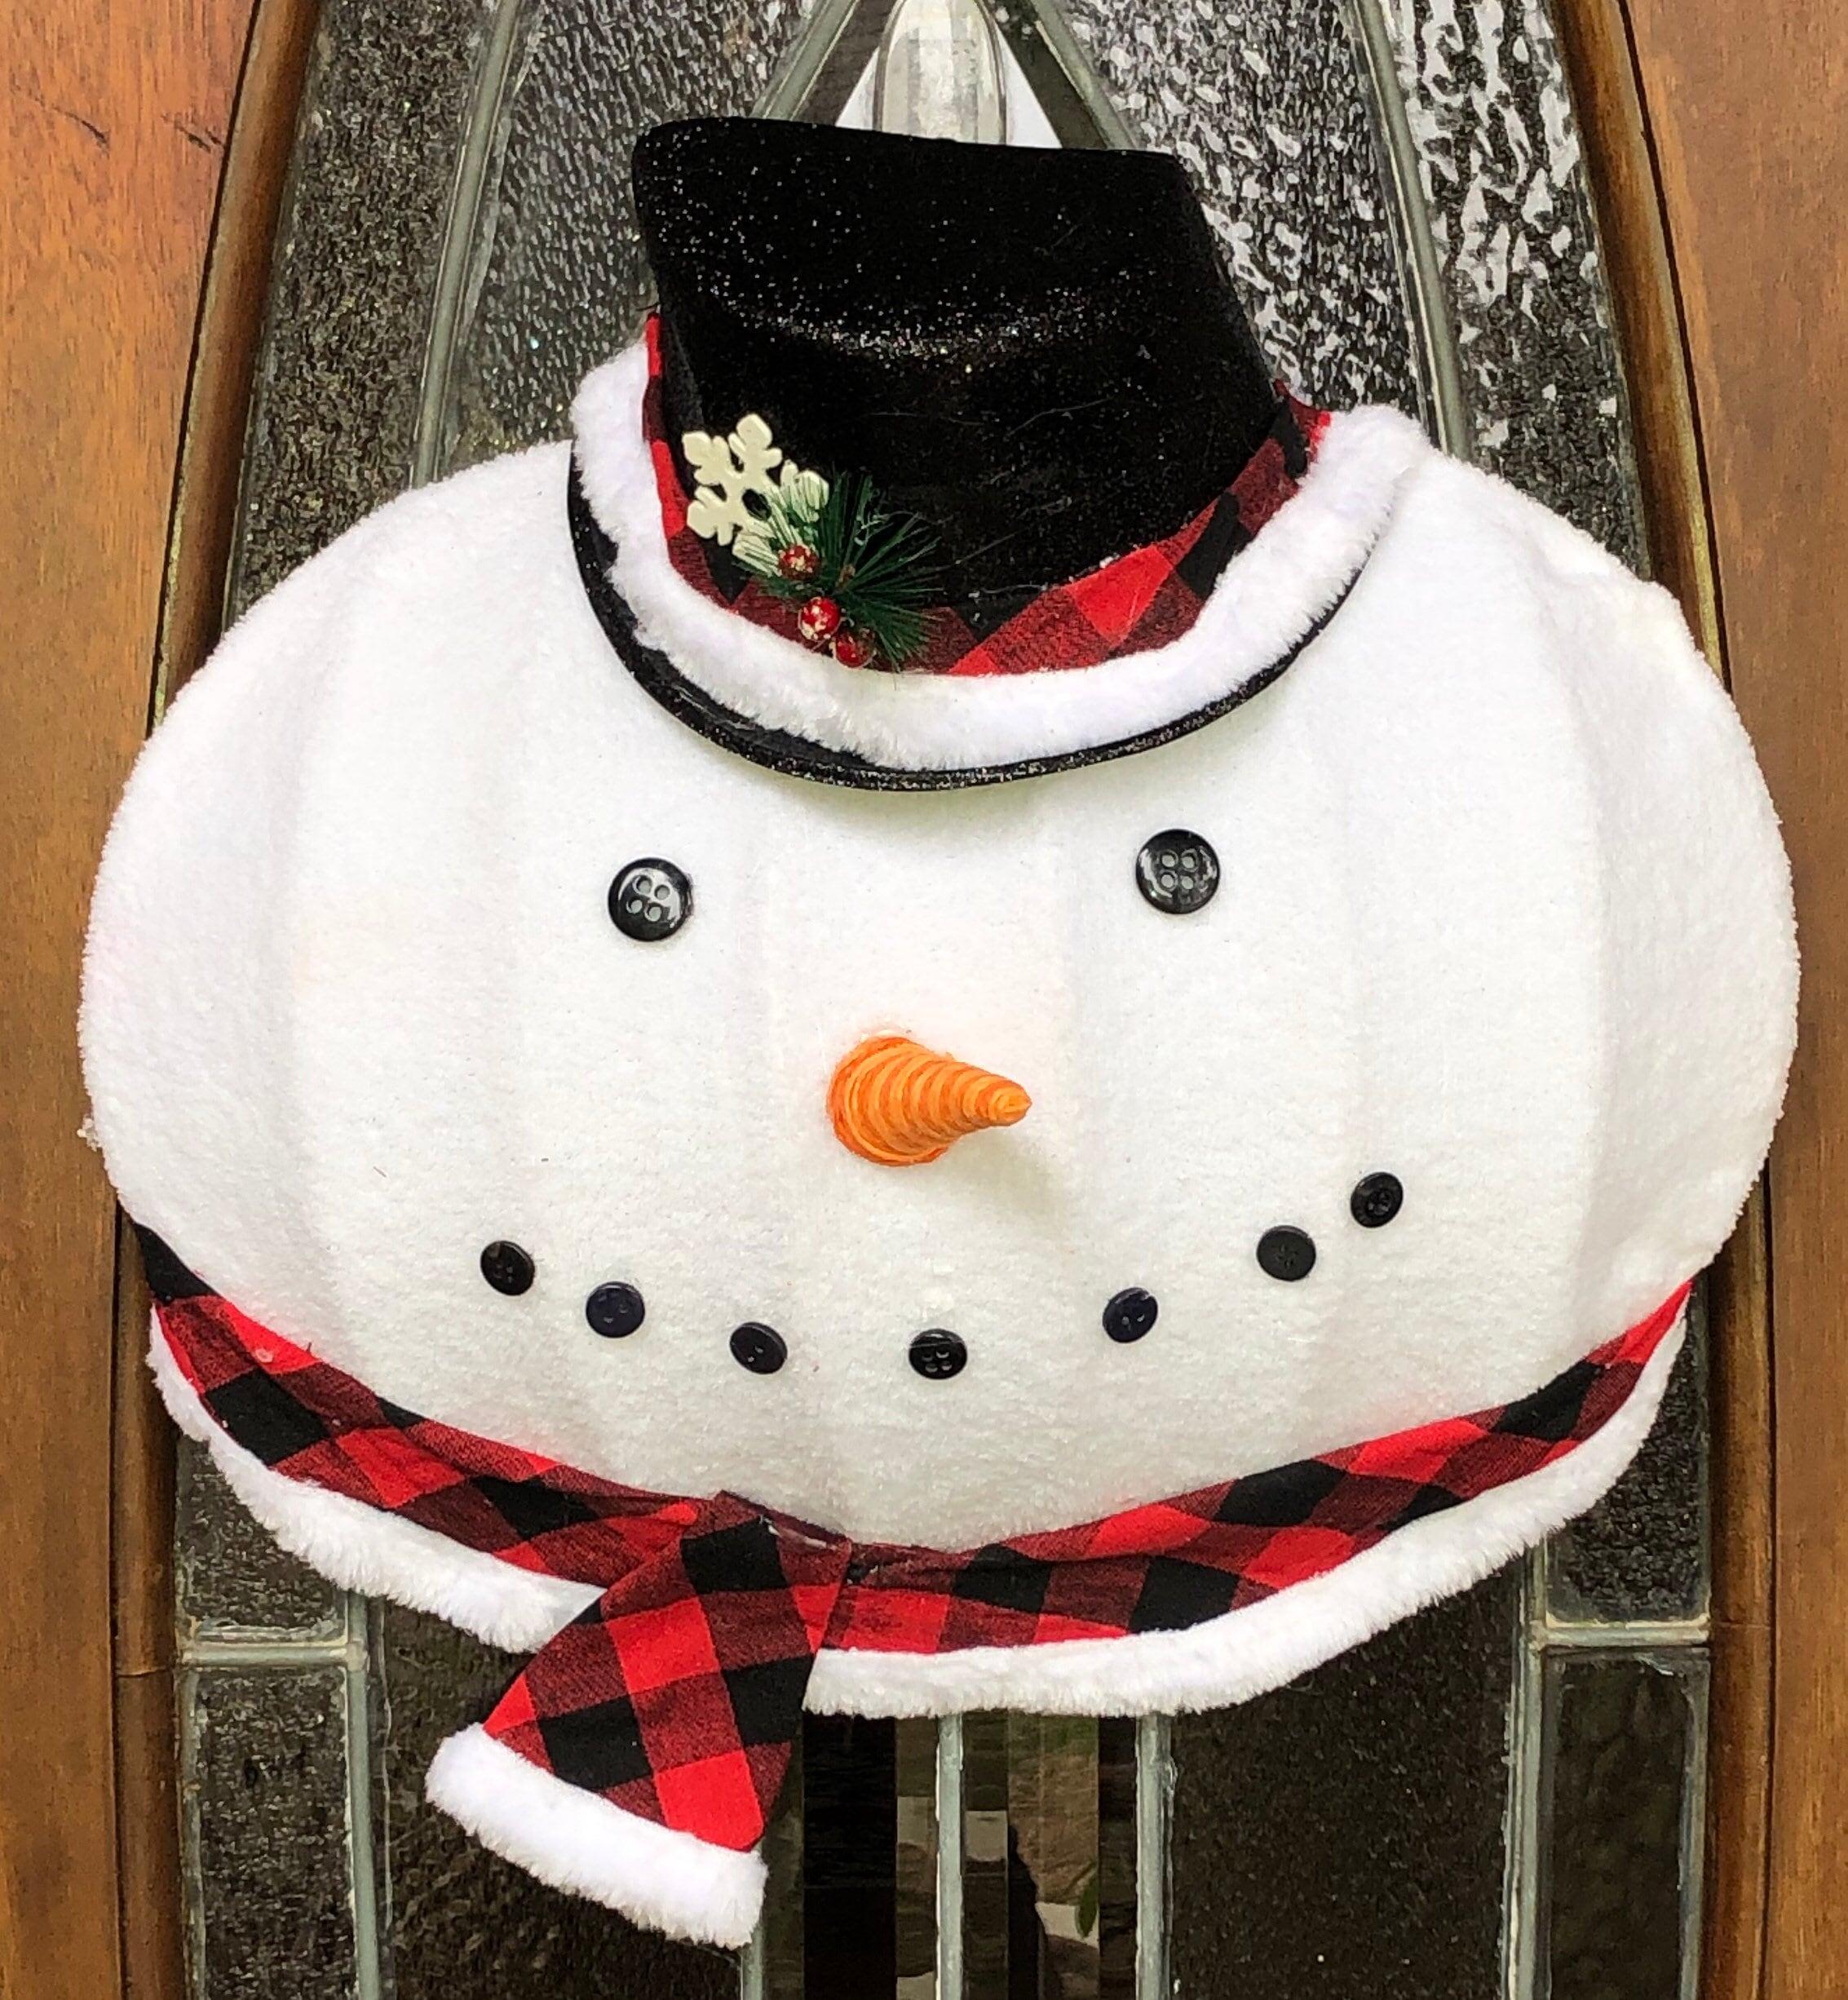 Snowman Christmas Wreath Door Hanger Holiday Wreath Snowman Decor Red Black Buffalo Check Christmas Decor